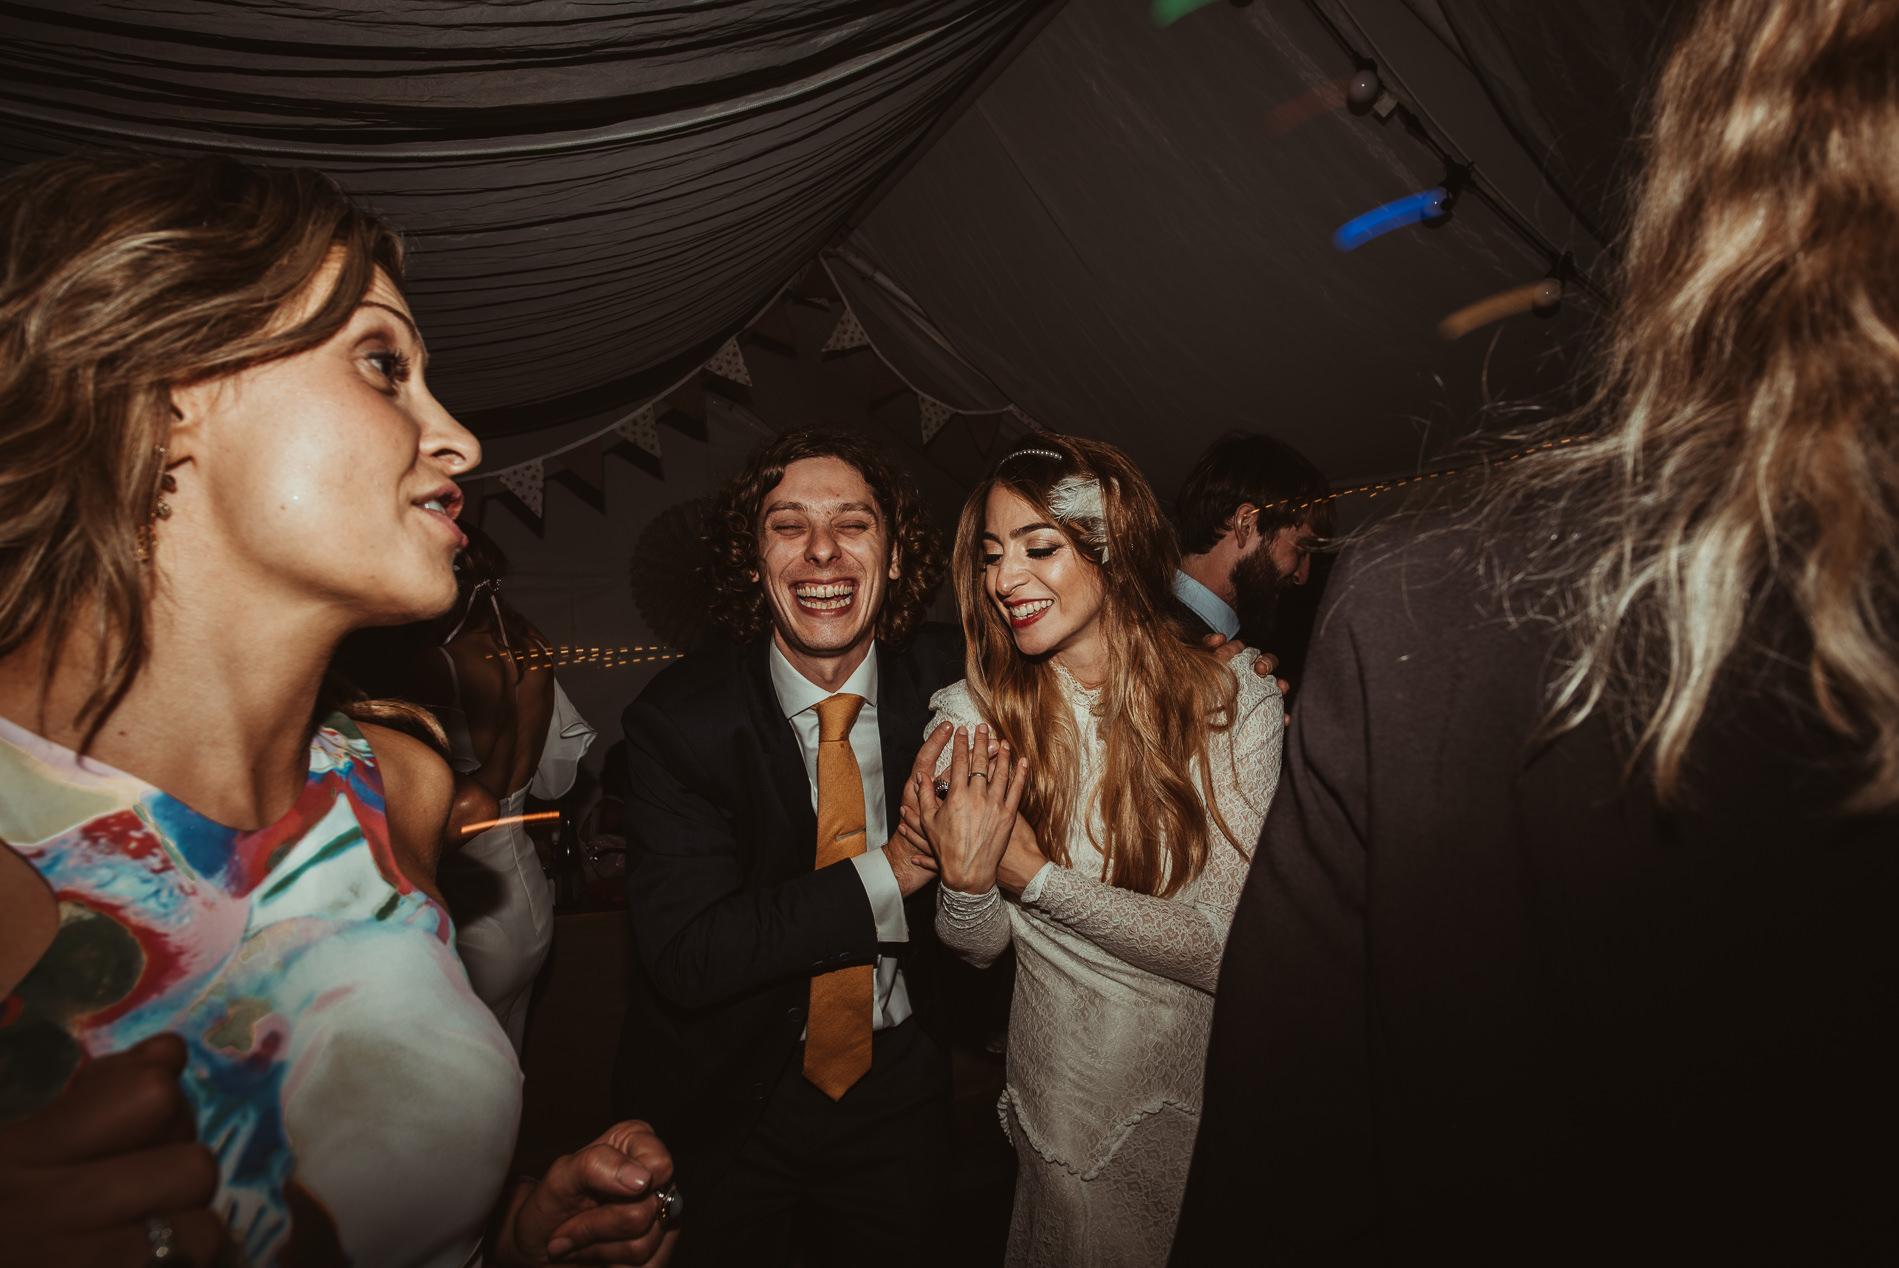 bohemian_wedding_lawshall_church_garden86